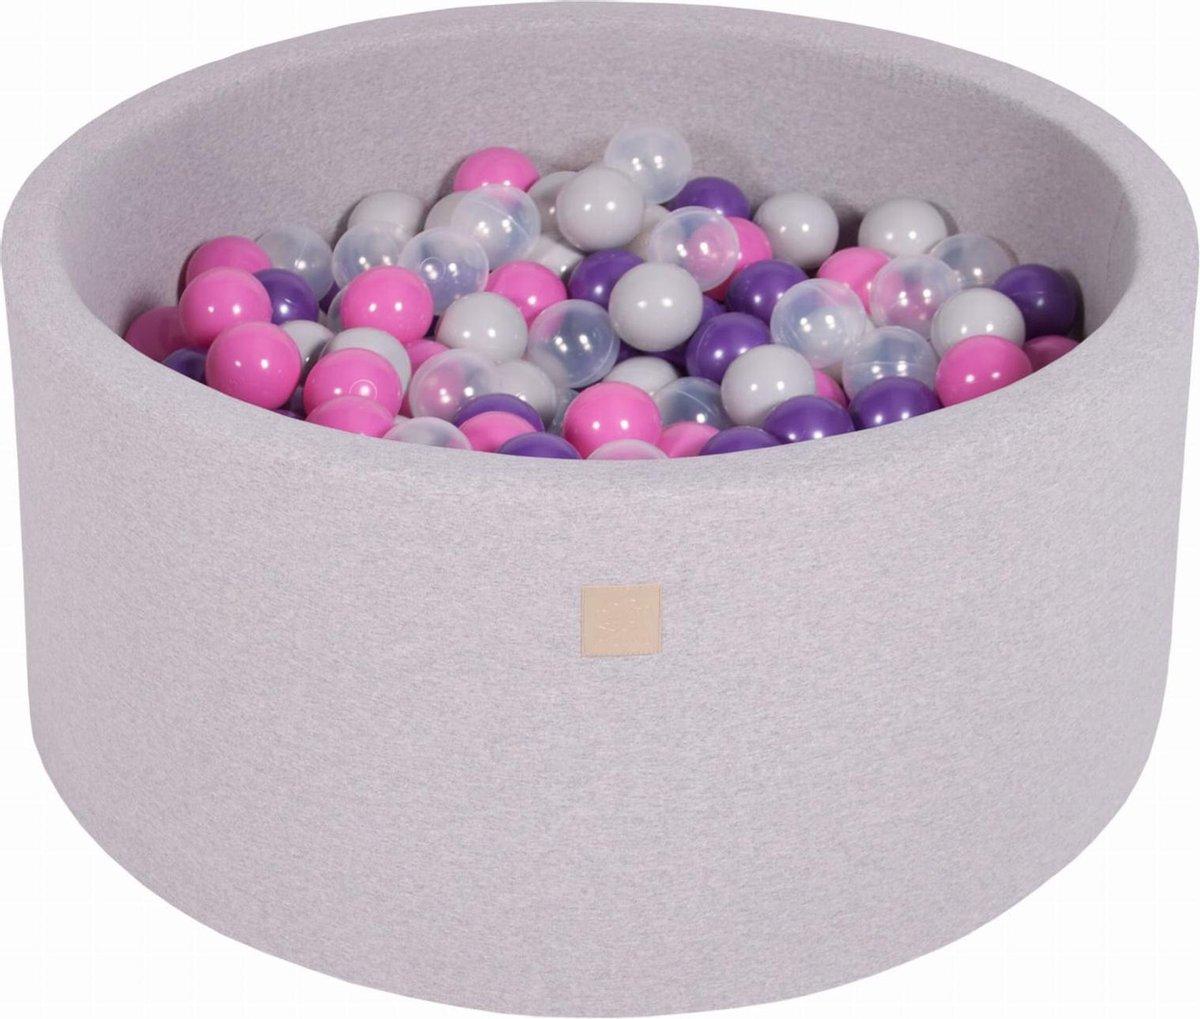 Ronde Ballenbak set incl 300 ballen 90x40cm - Licht Grijs: Donker Roze, Violet, Transparant, Grijs